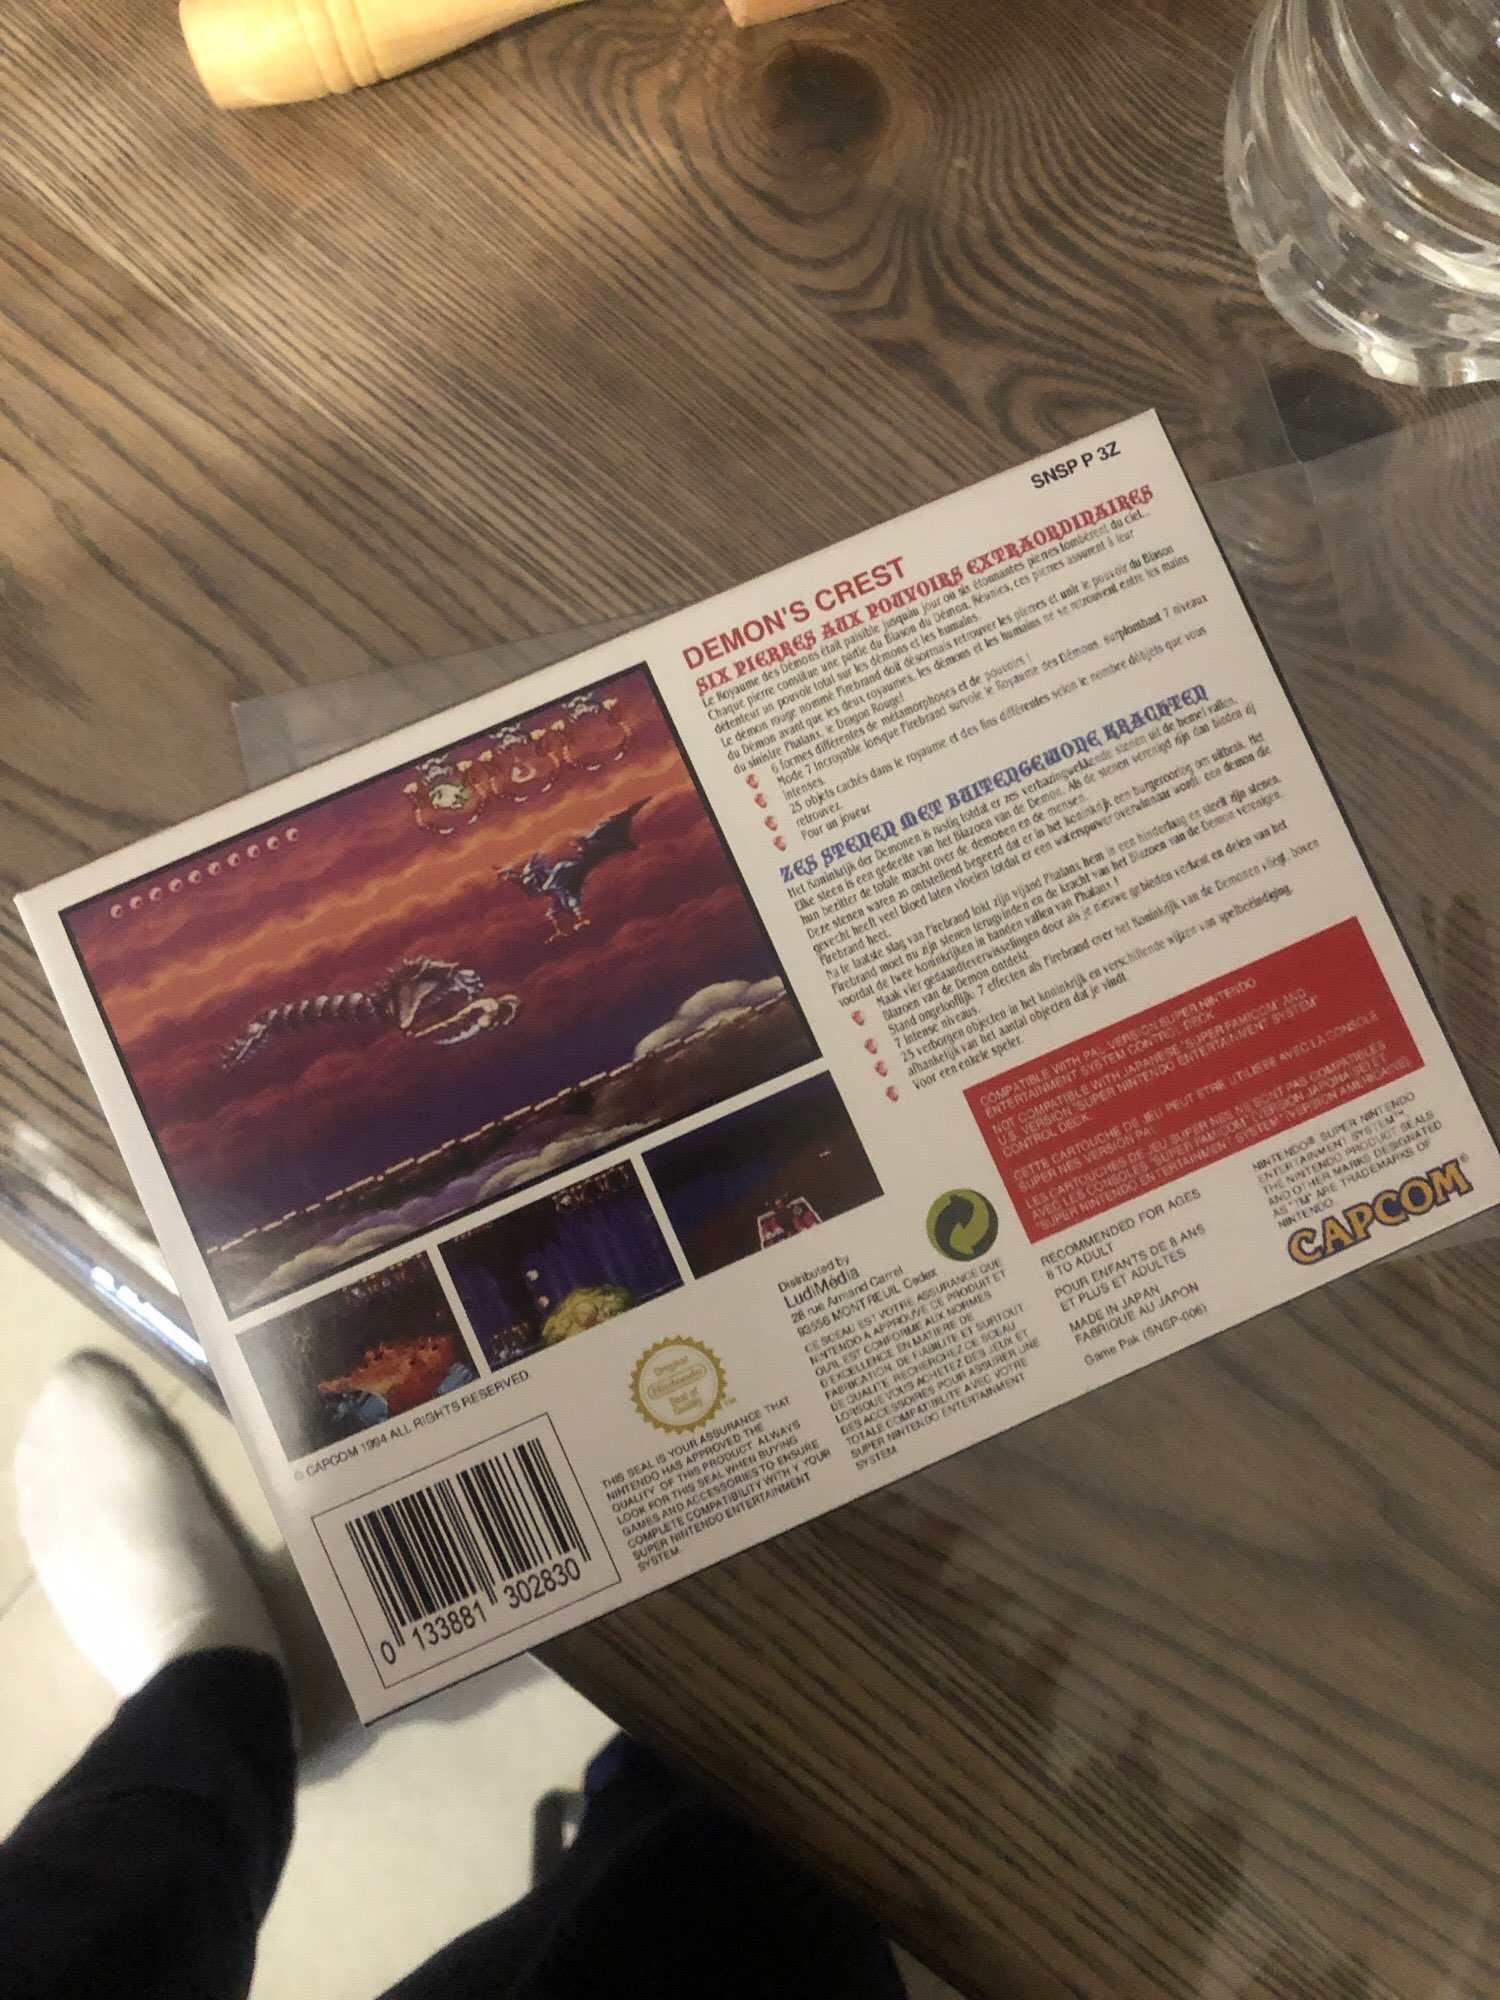 Demon's Crest with box for pal 16bit game cartidge EU Version photo review